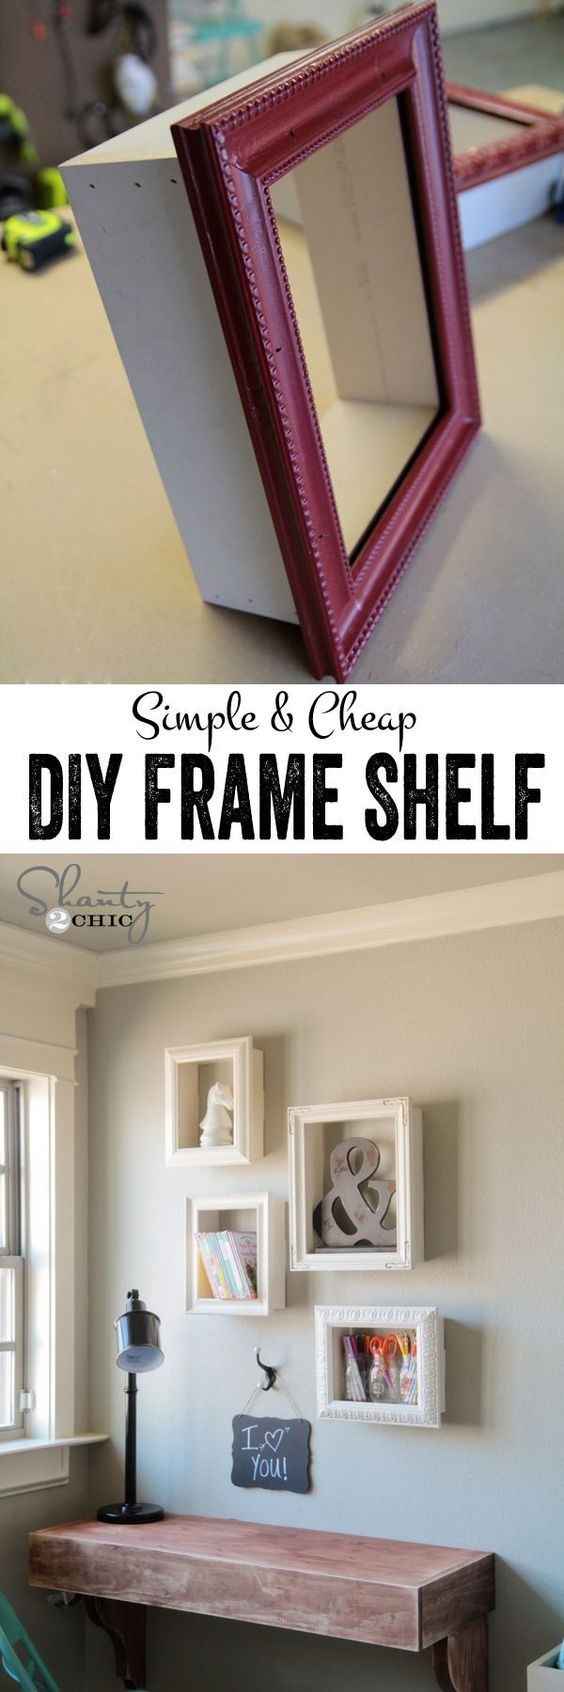 15 Fantastic and Economic DIY Home Decor Crafts